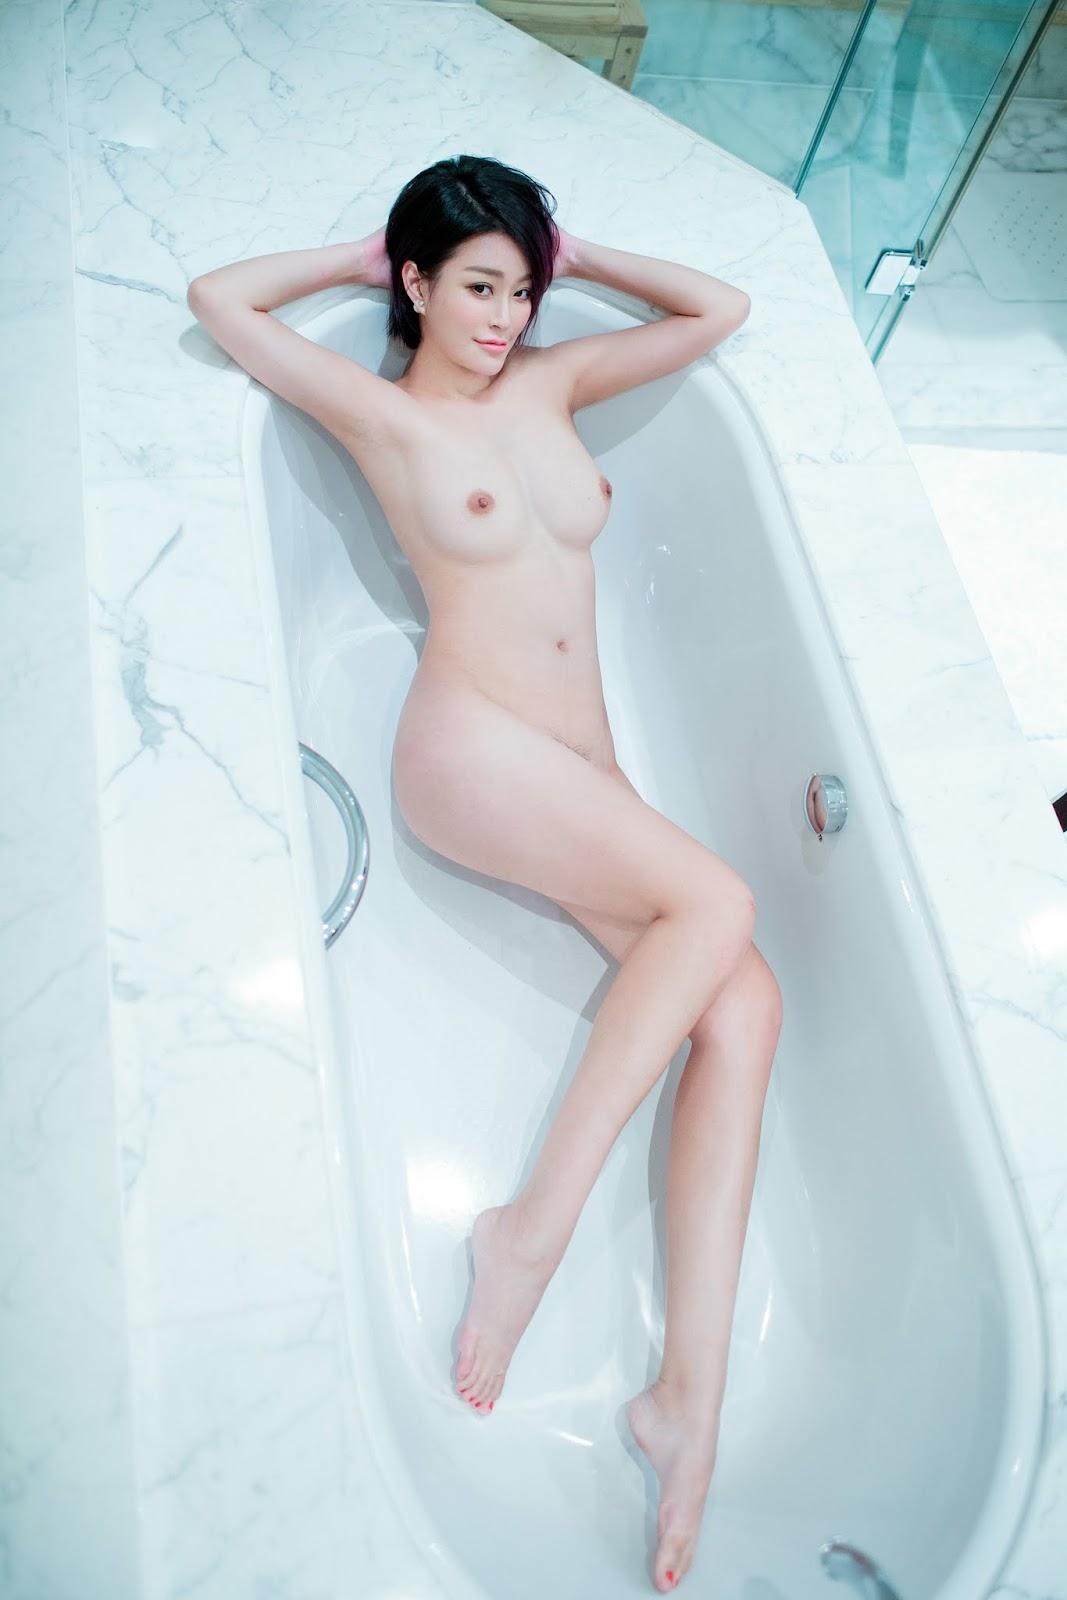 034 - Nude Girl TUIGIRL NO.45 Sexy Love Pussy